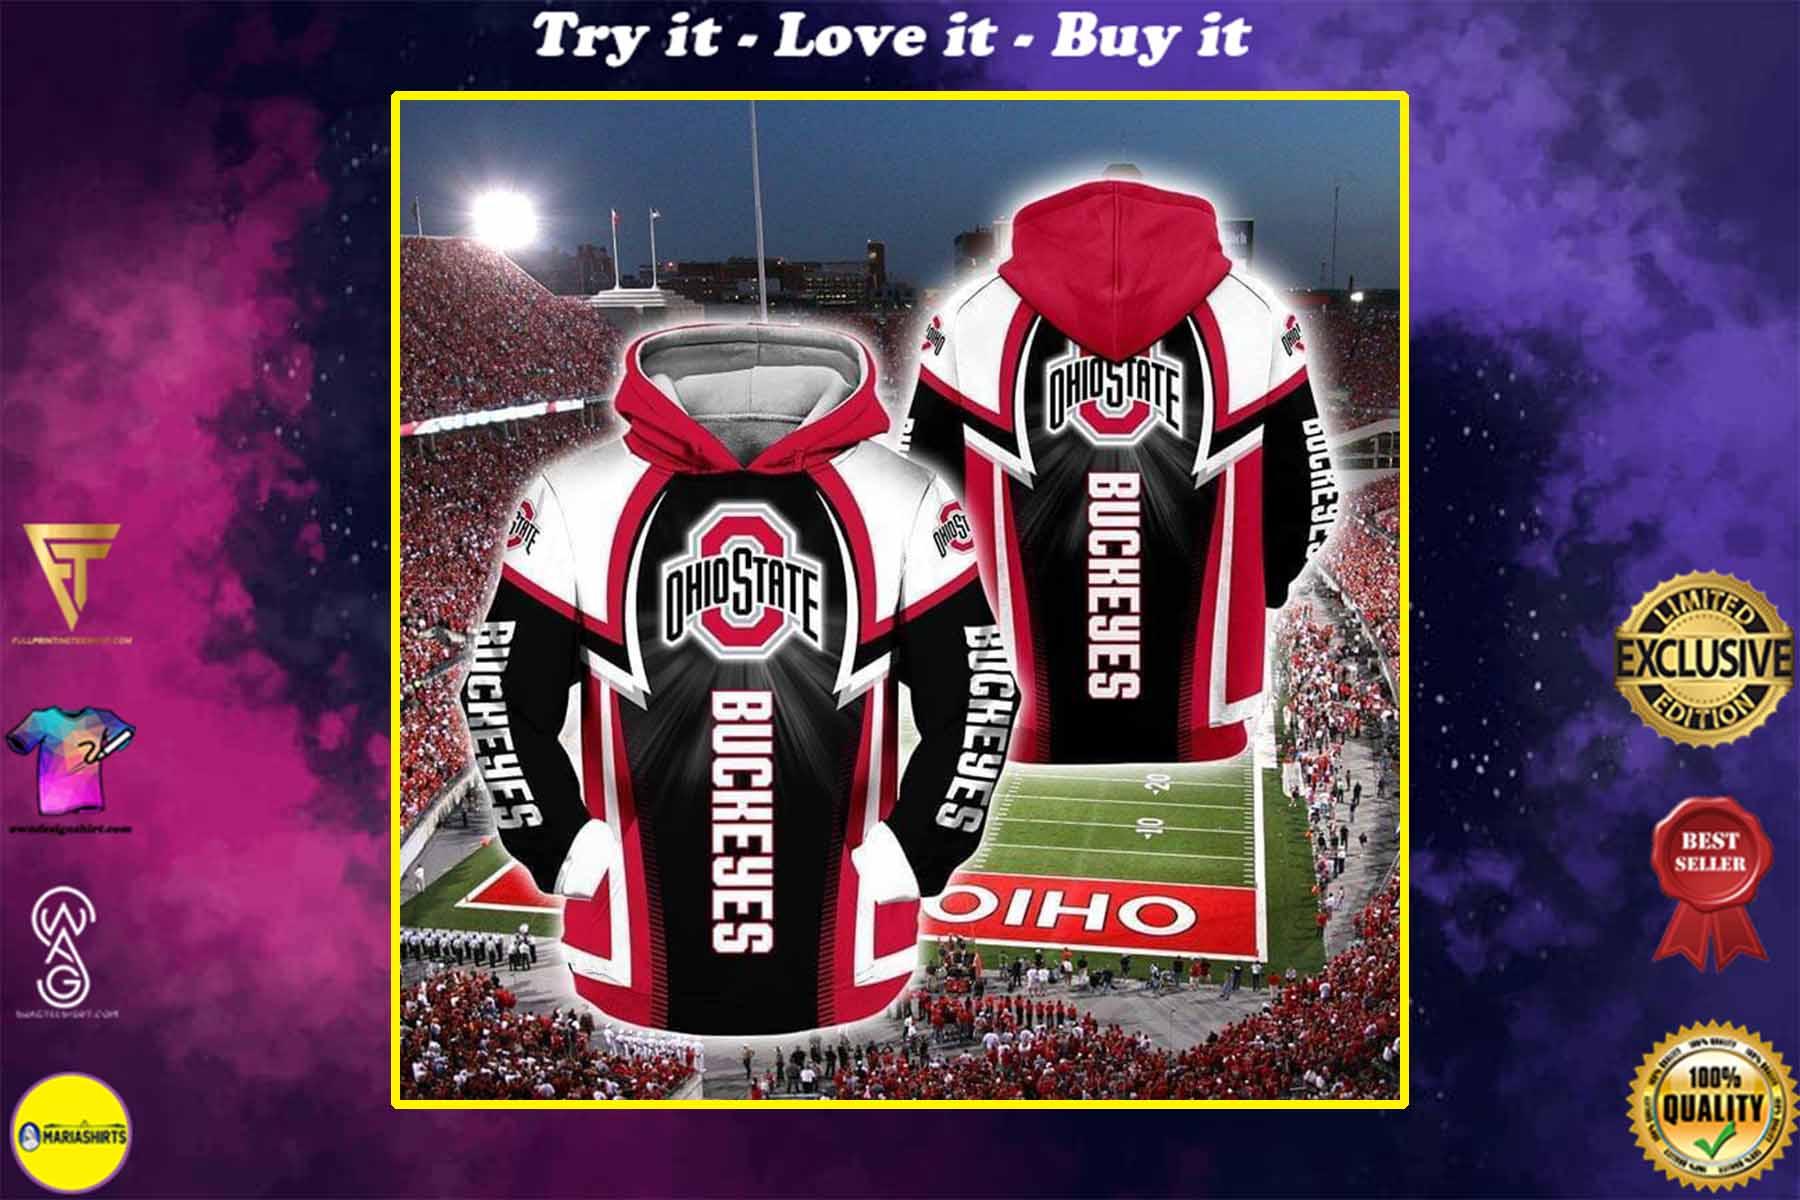 the ohio state buckeyes football team full over printed shirt